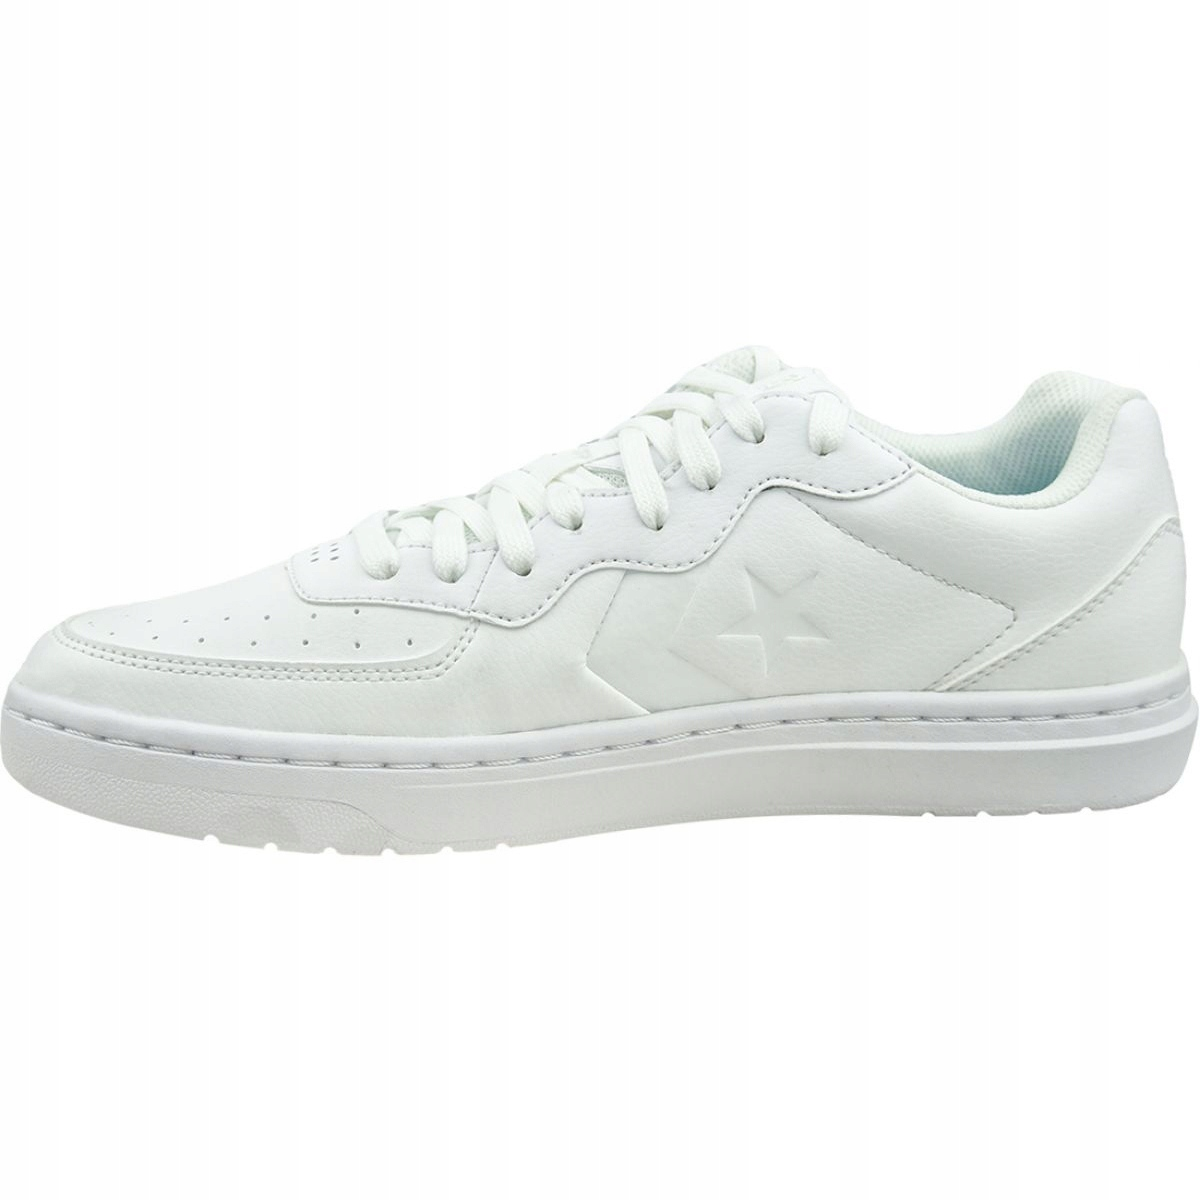 Converse Rival Ox M 164445C shoes white